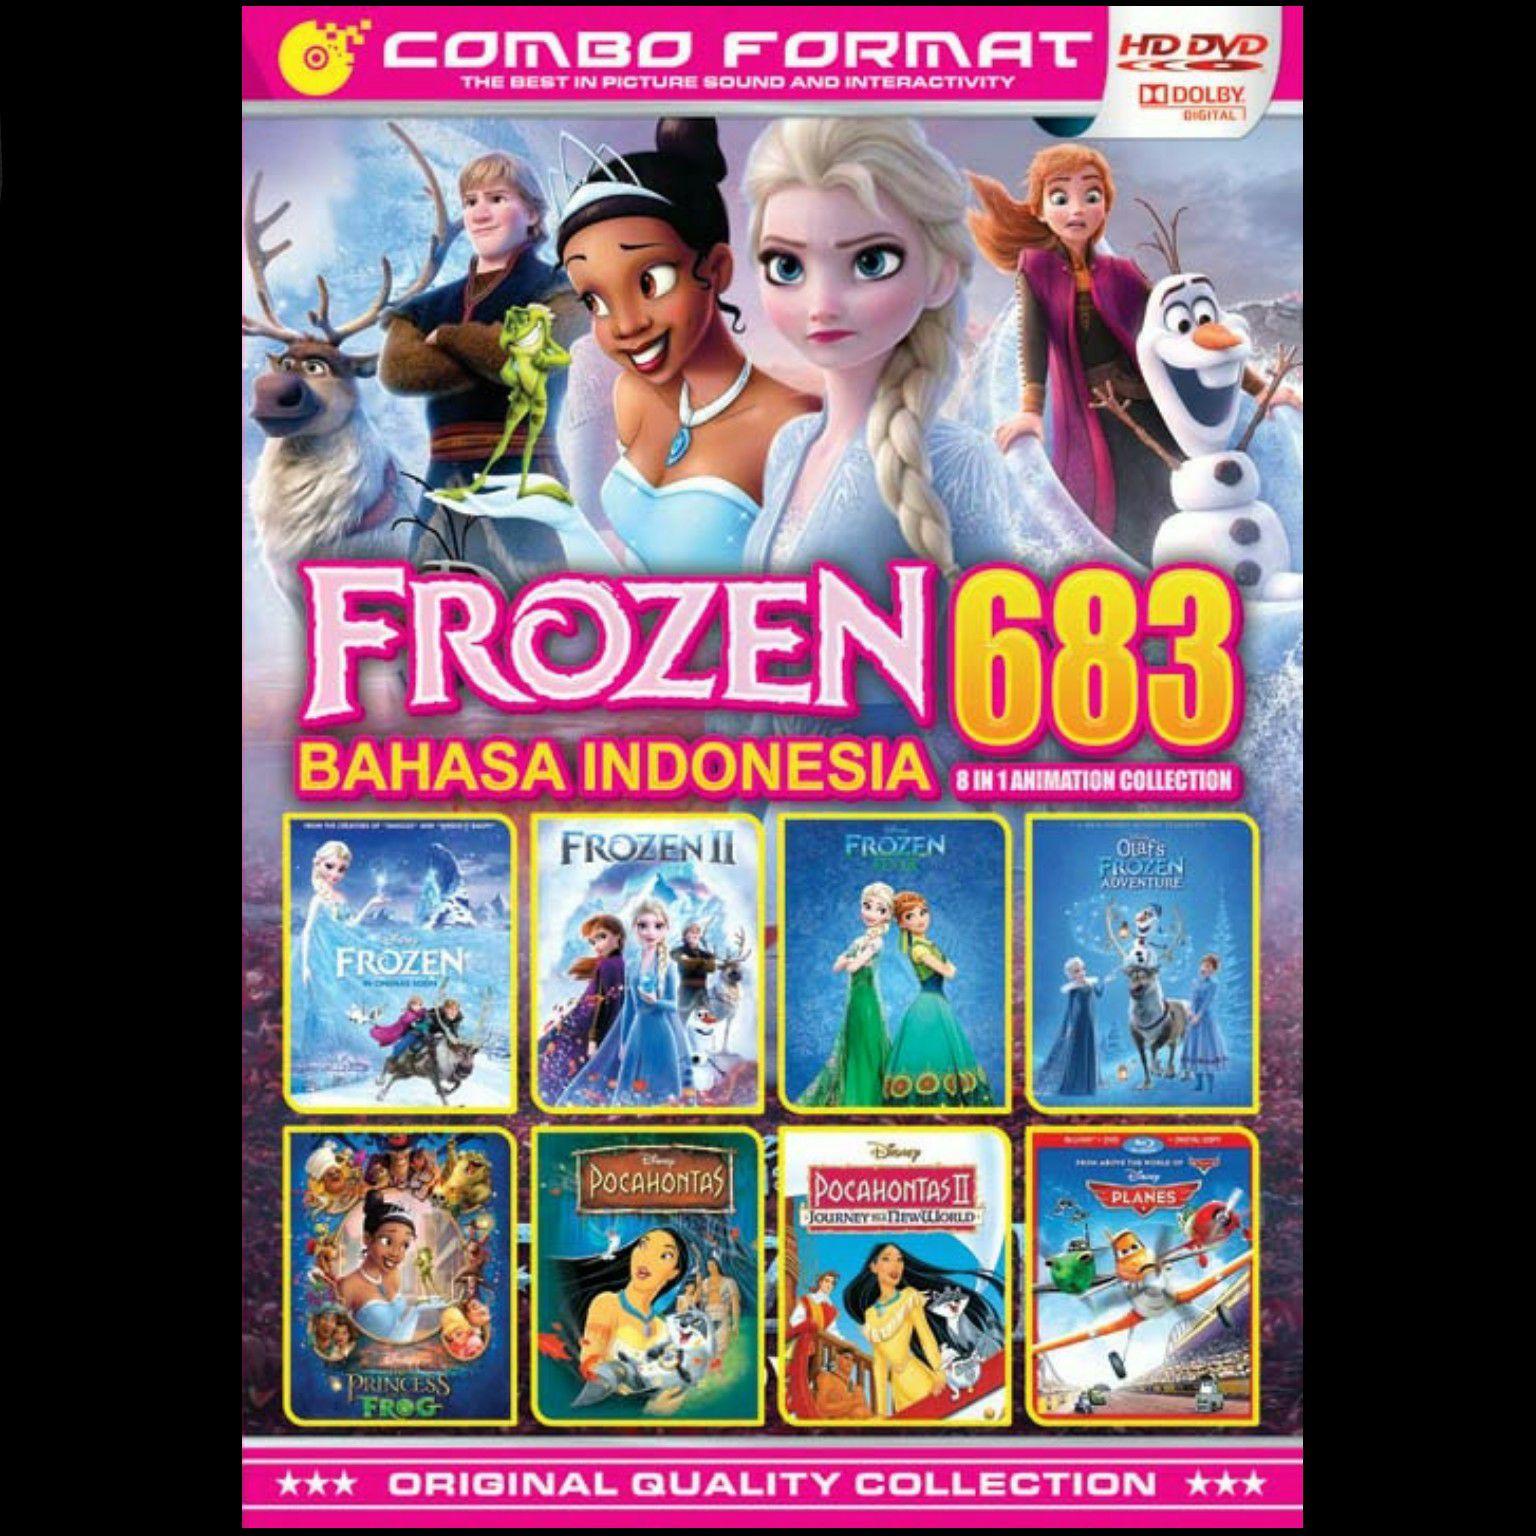 Kaset Dvd Film Kartun Movie Collection Frozen 683 Dubing Bahasa Indonesia Lazada Indonesia